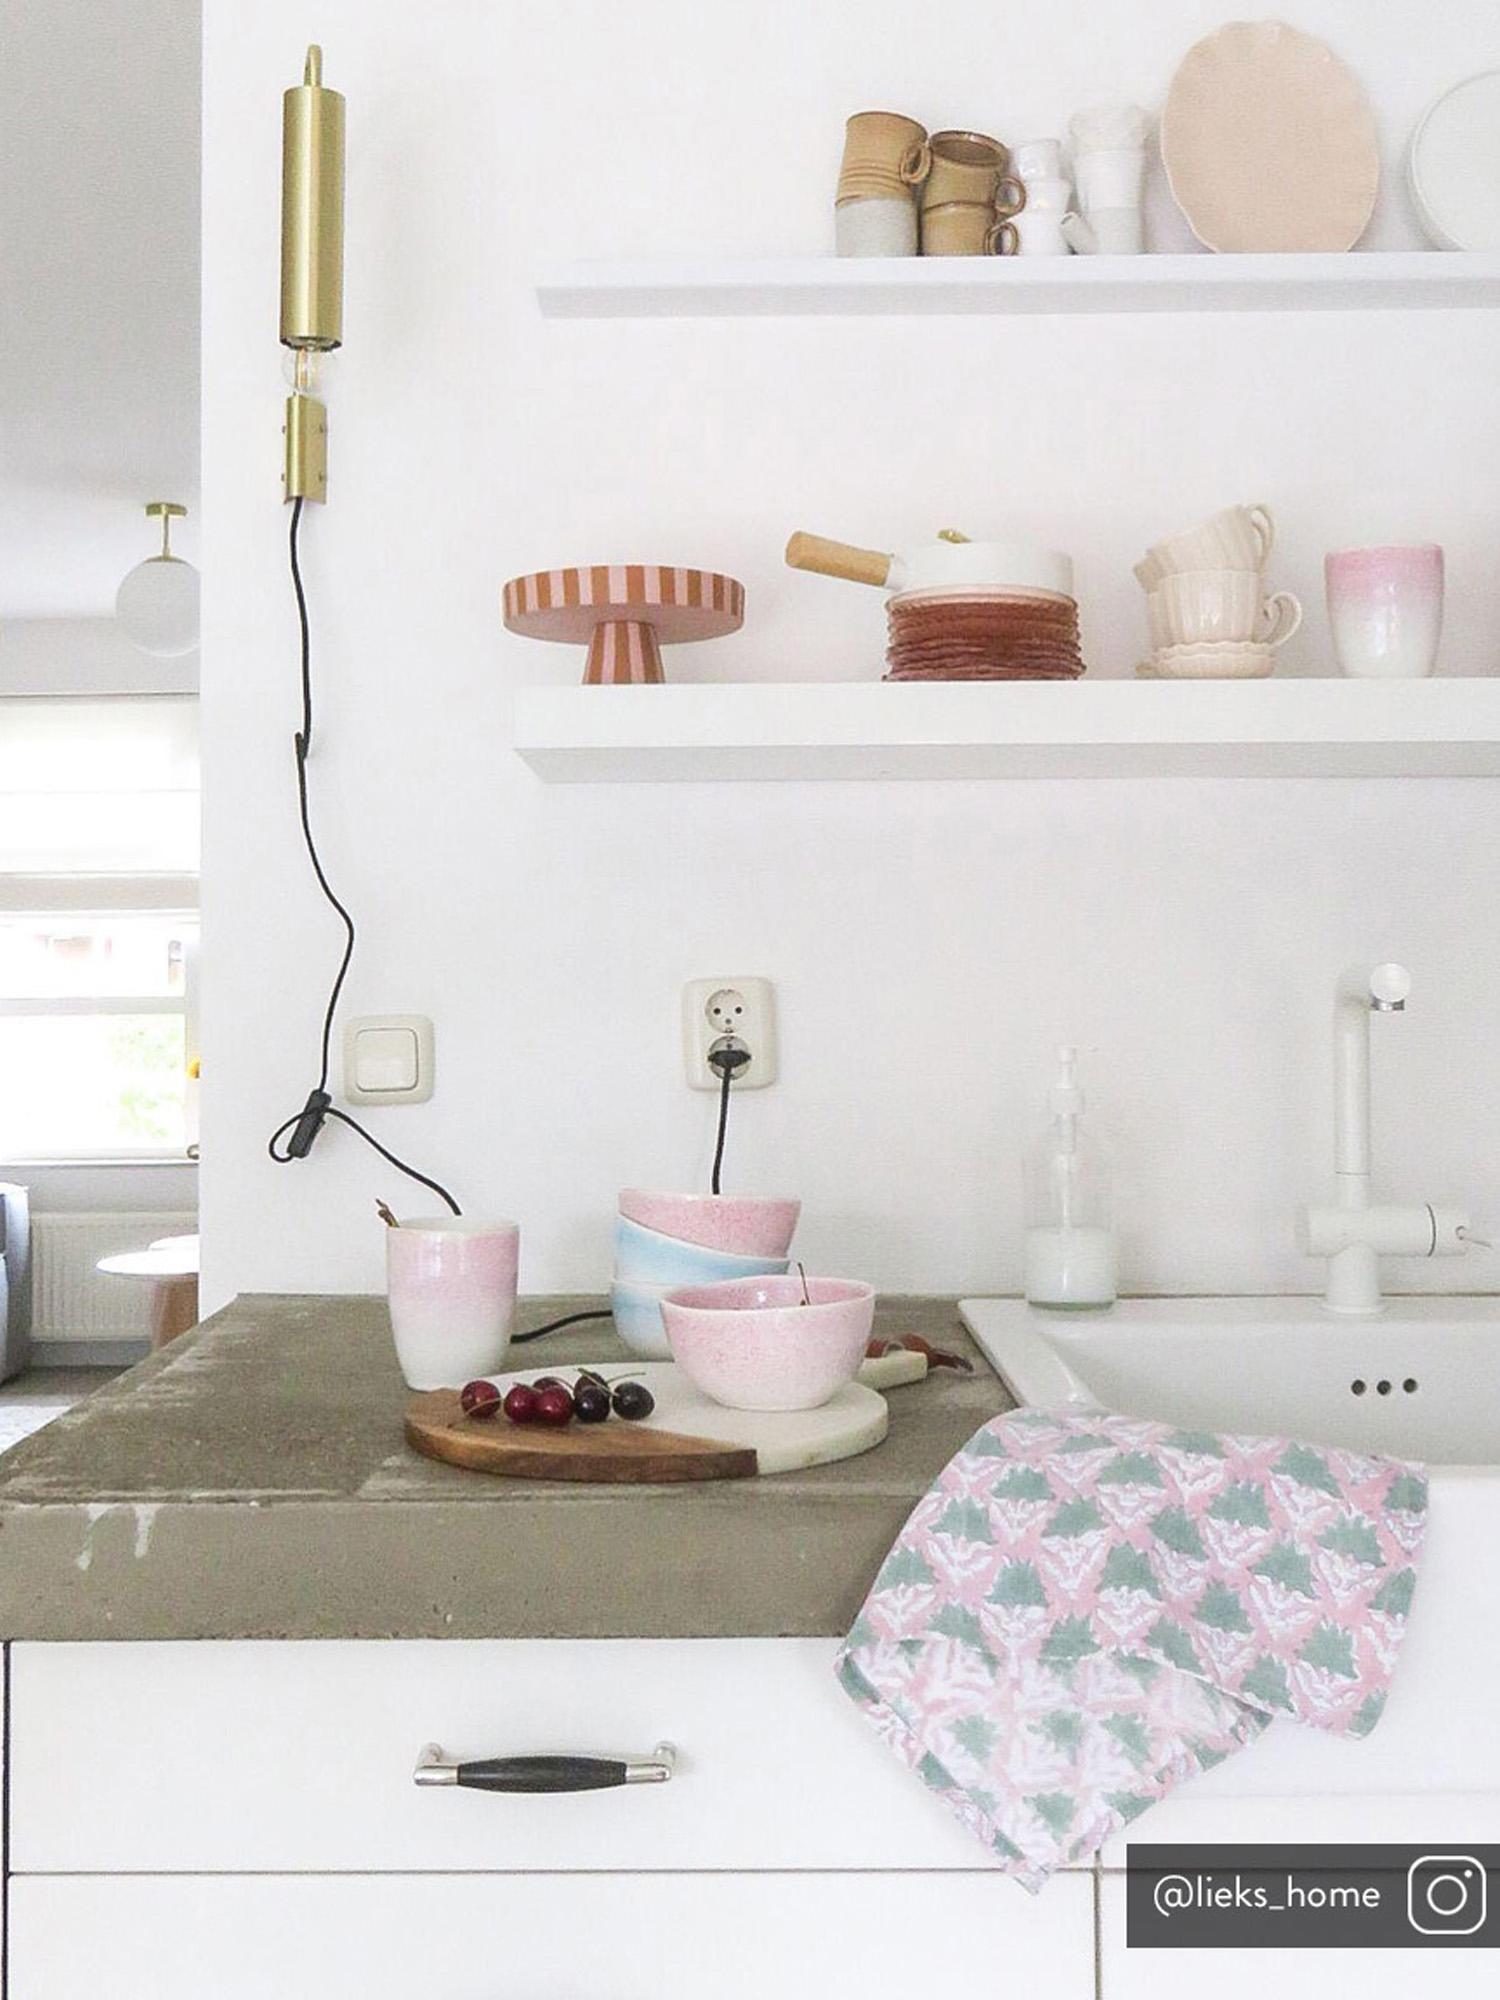 Bols artisanaux Amalia, 2 pièces, Rose pastel, blanc crème